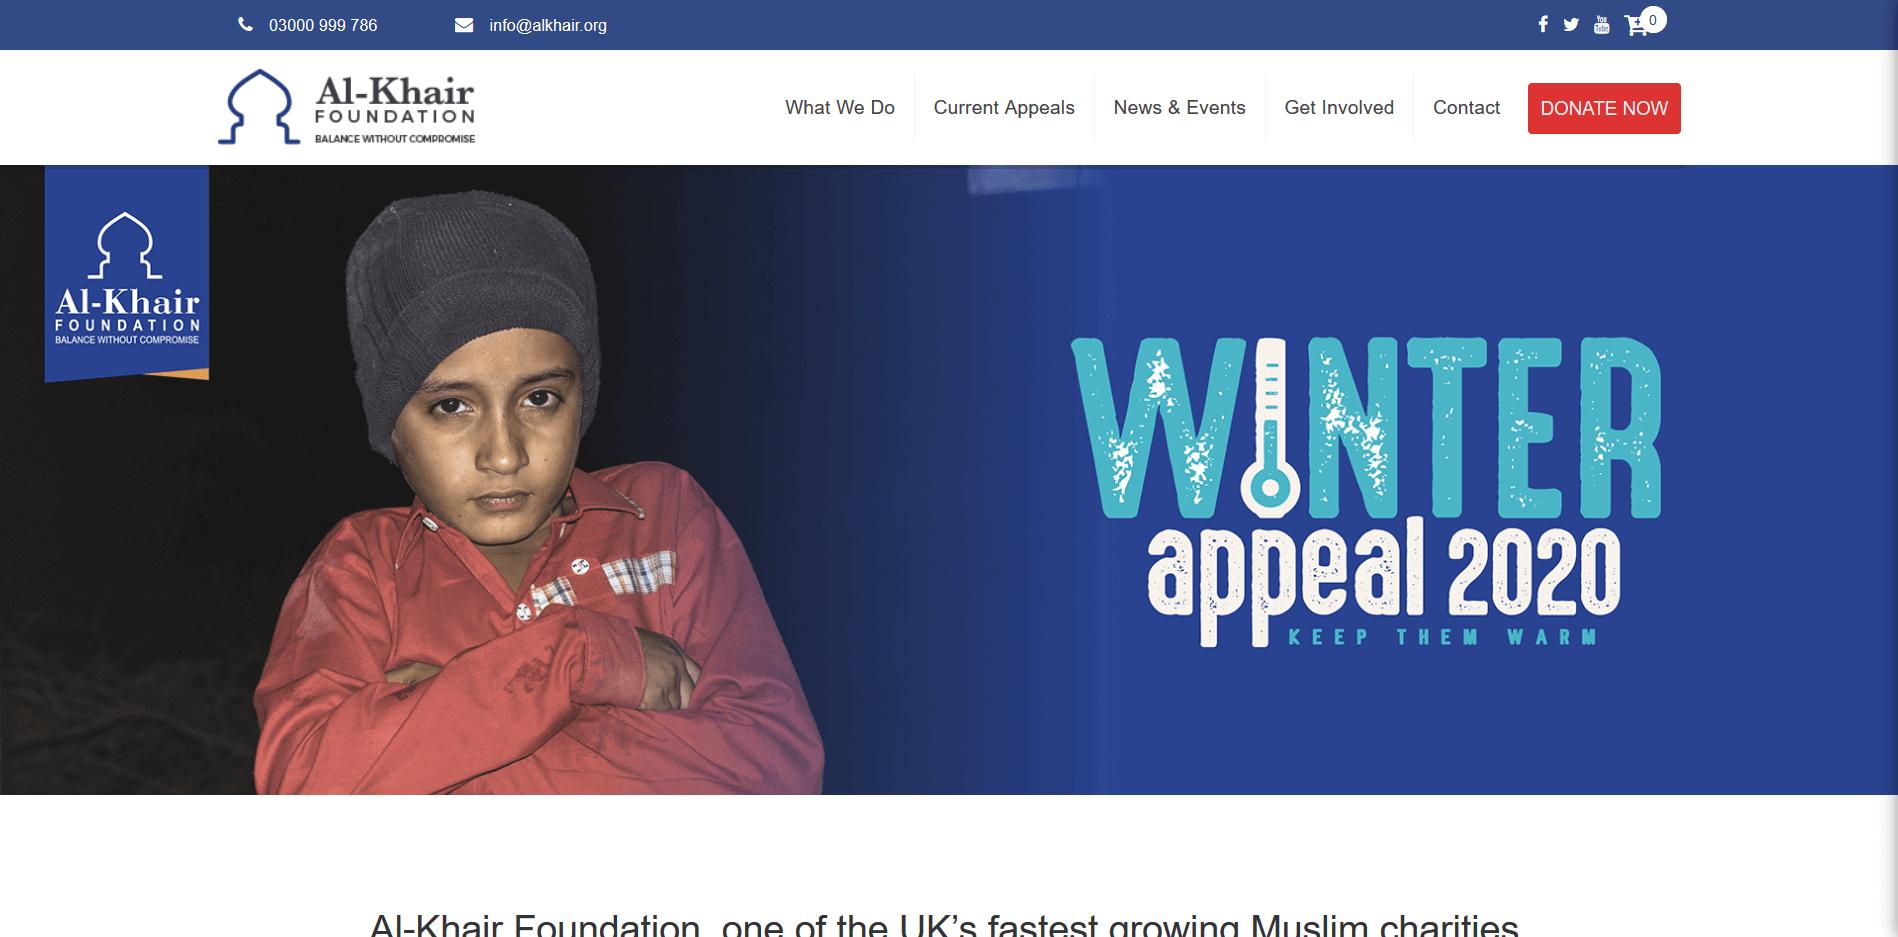 Charity Organization - 3 Krocess